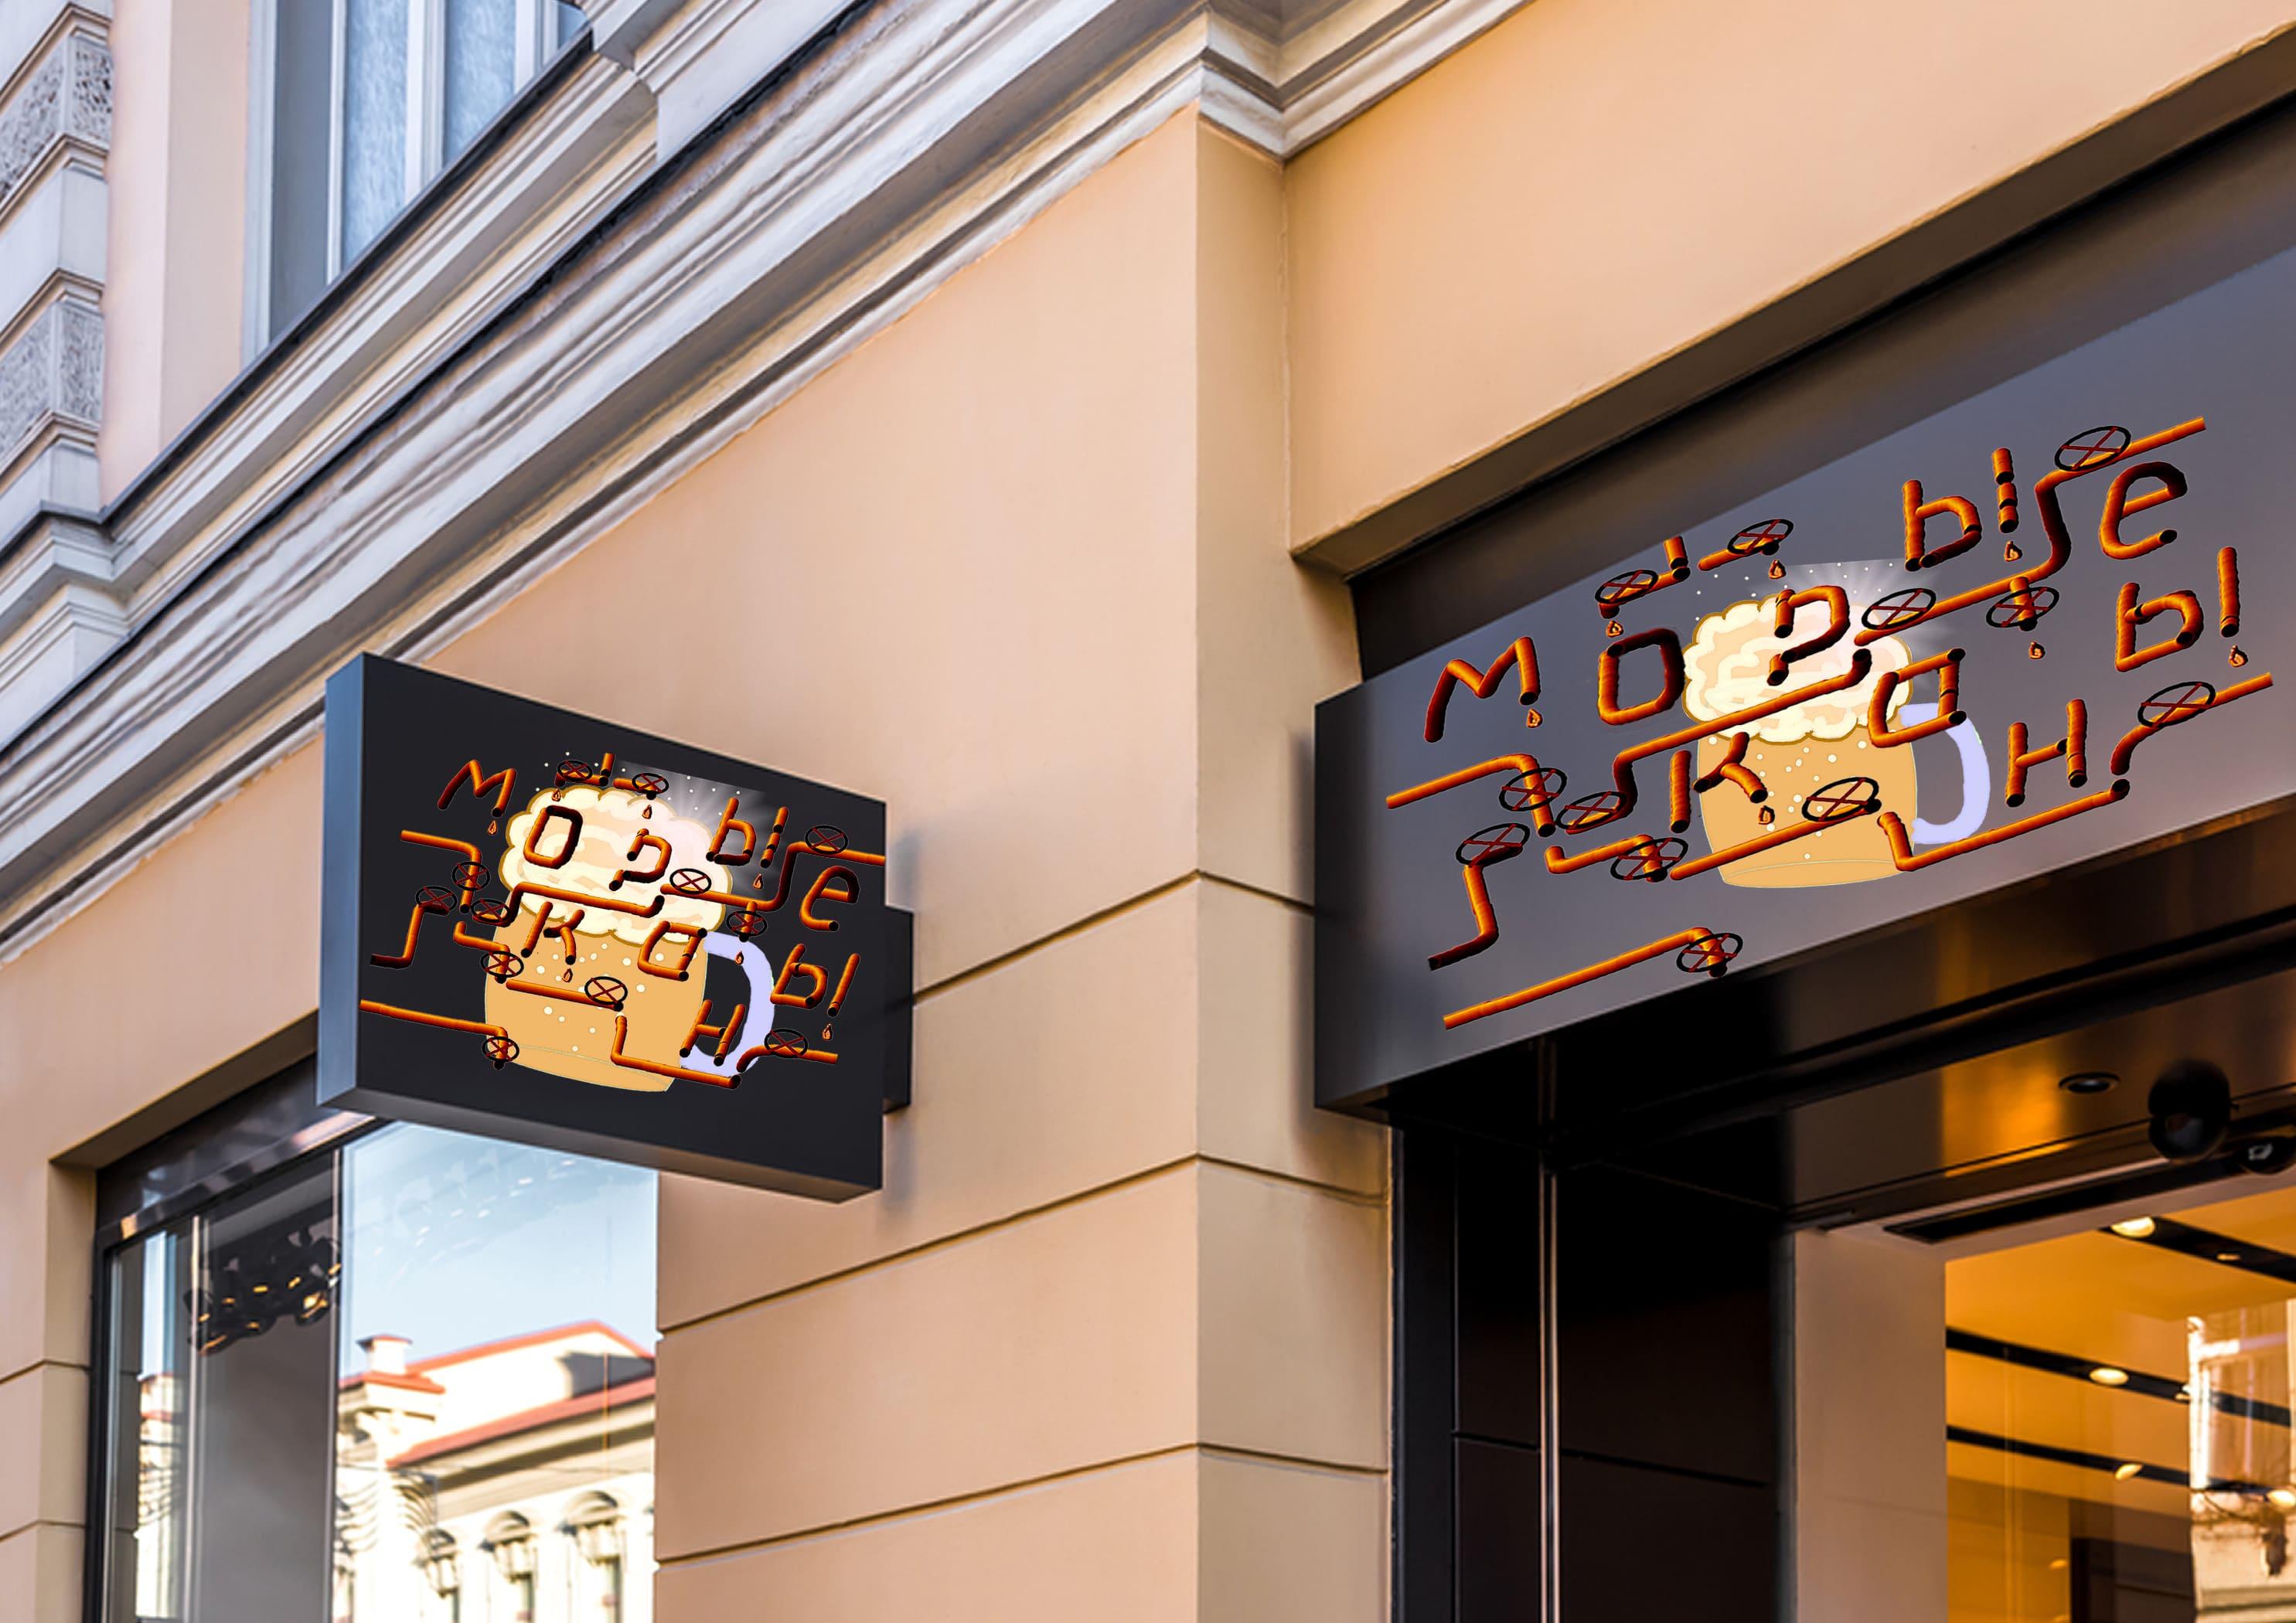 Вывеска/логотип для пивного магазина фото f_2916026b8faaebff.jpg